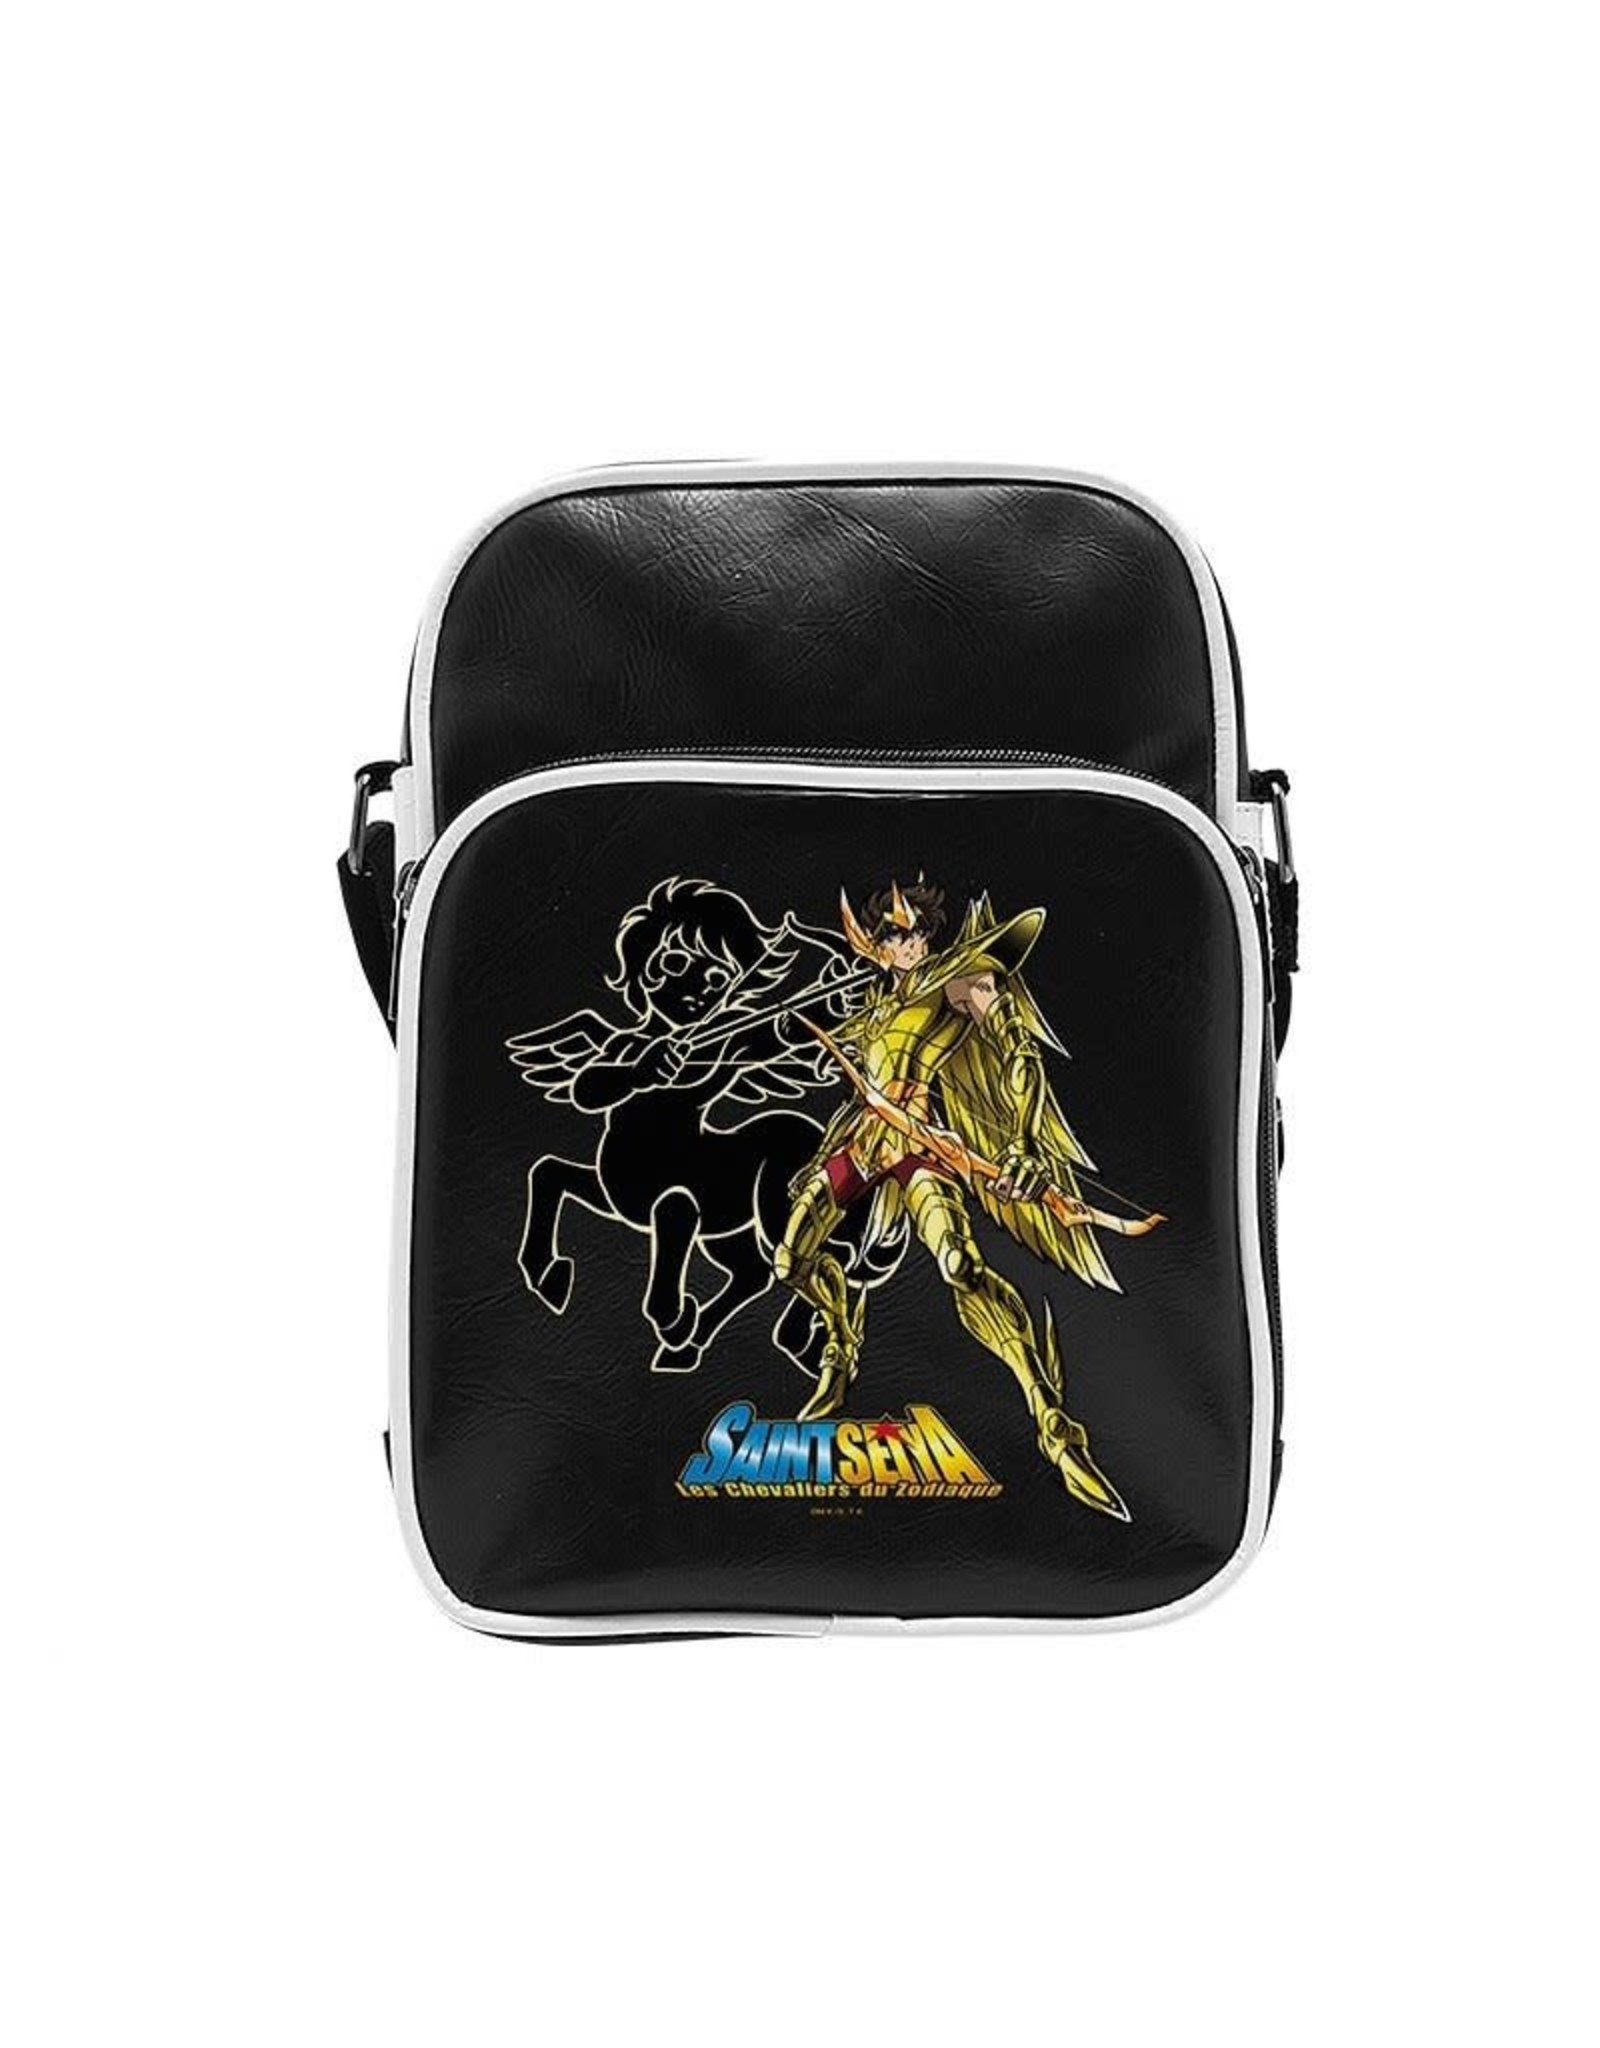 SAINT SEIYA - Messenger Bag Vinyle Sagitarius - Small Size